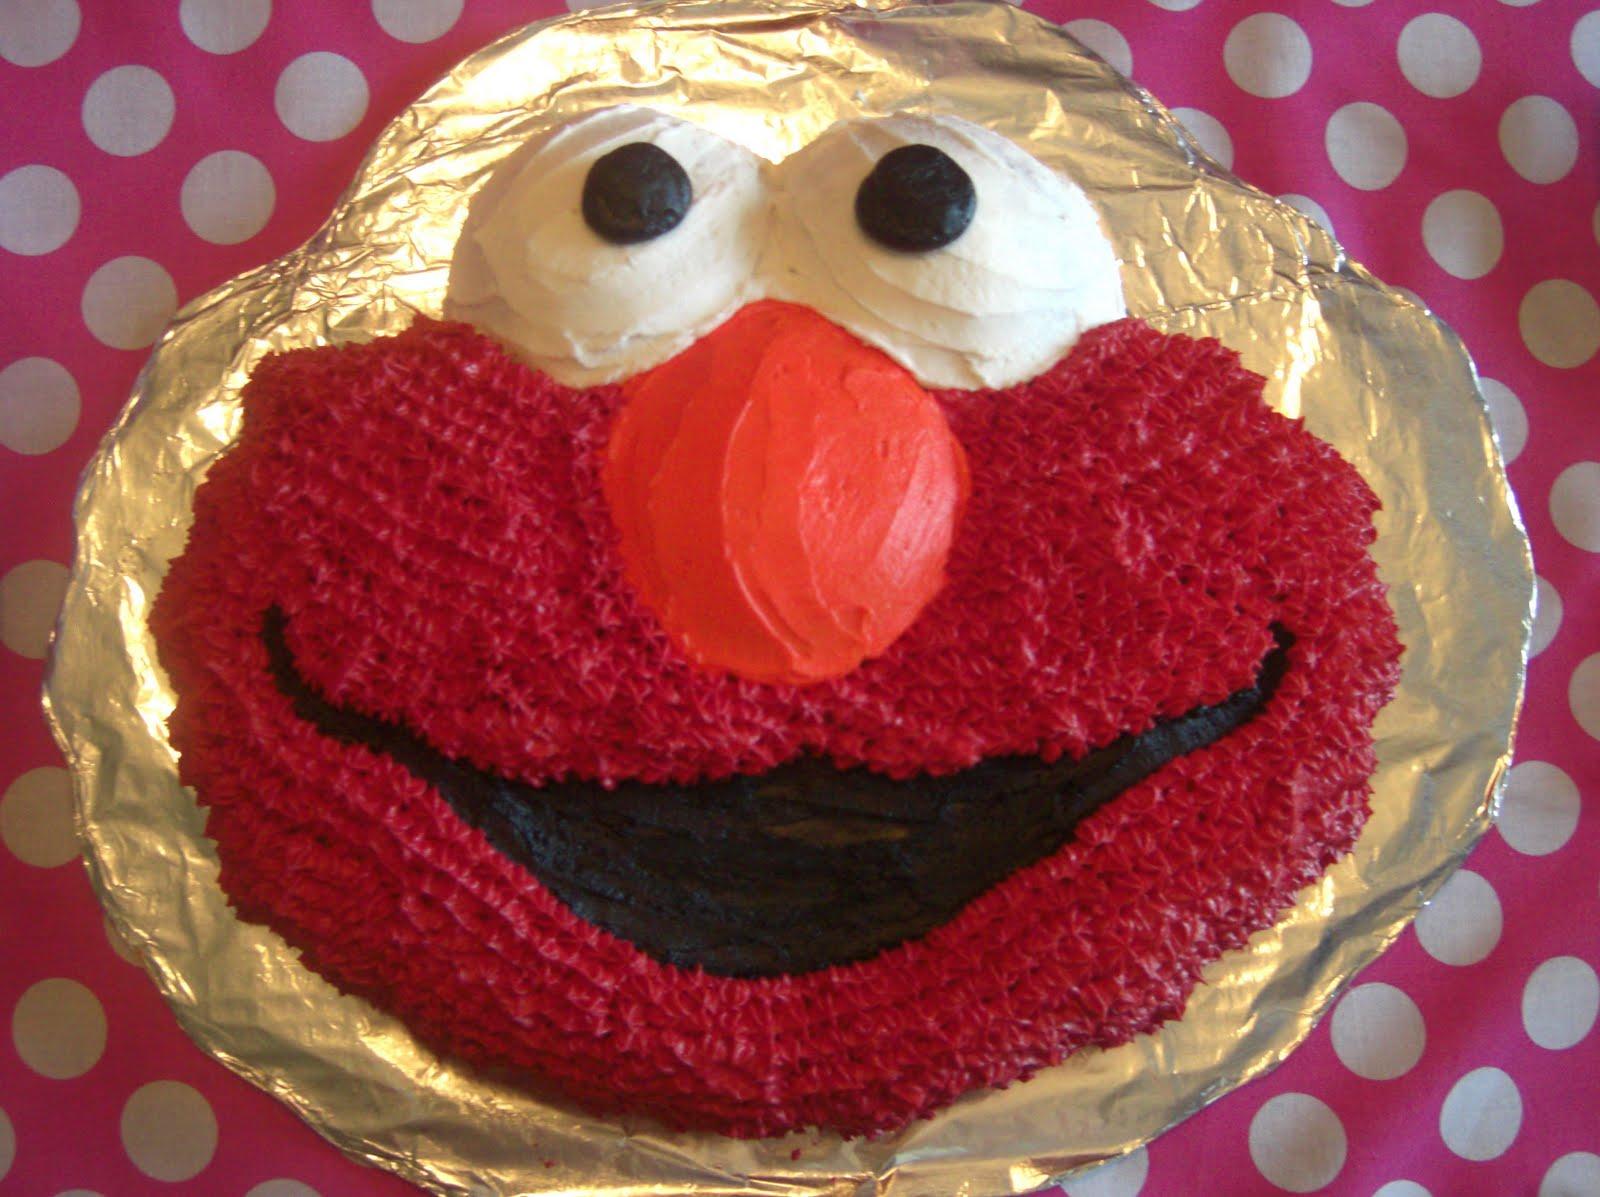 I think i can modify my elmo cake skills and make it a